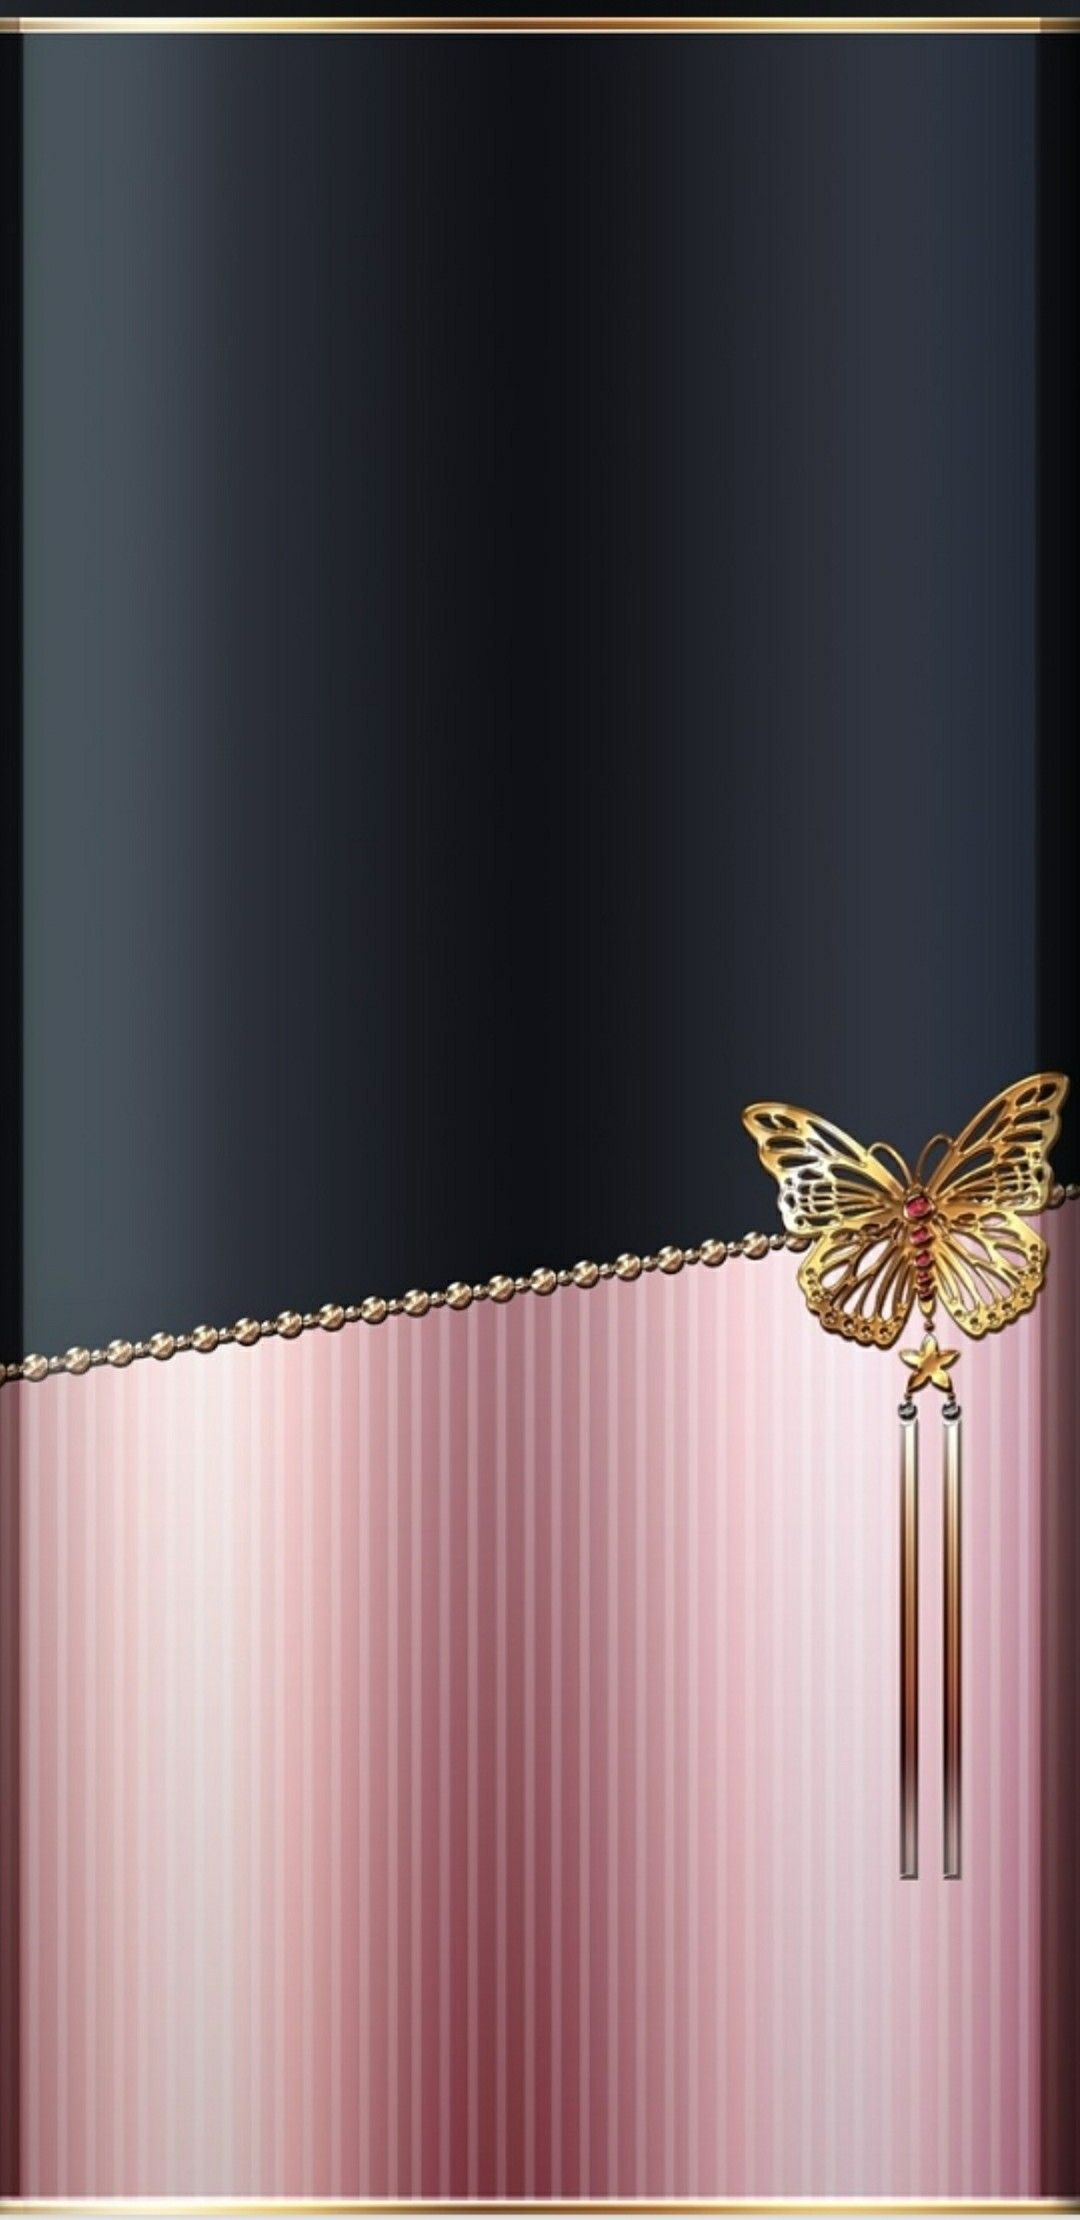 black and rose gold fend cran fond ecran arri re. Black Bedroom Furniture Sets. Home Design Ideas